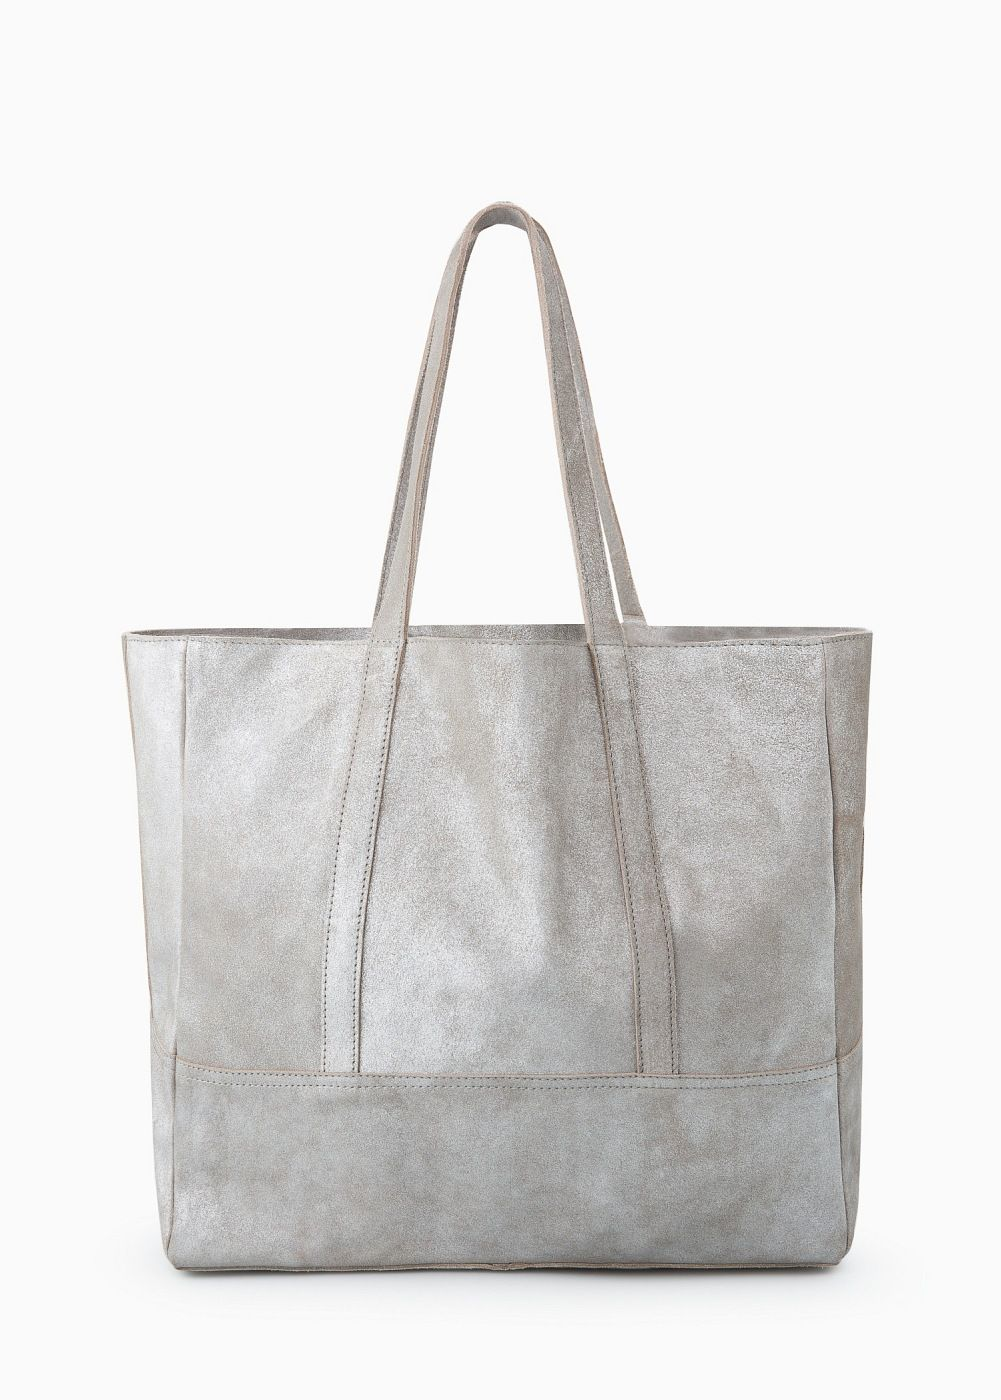 b711cd269f5b4a Wildleder-shopper - Damen | Inspiration | Wildleder, Shopper tasche ...